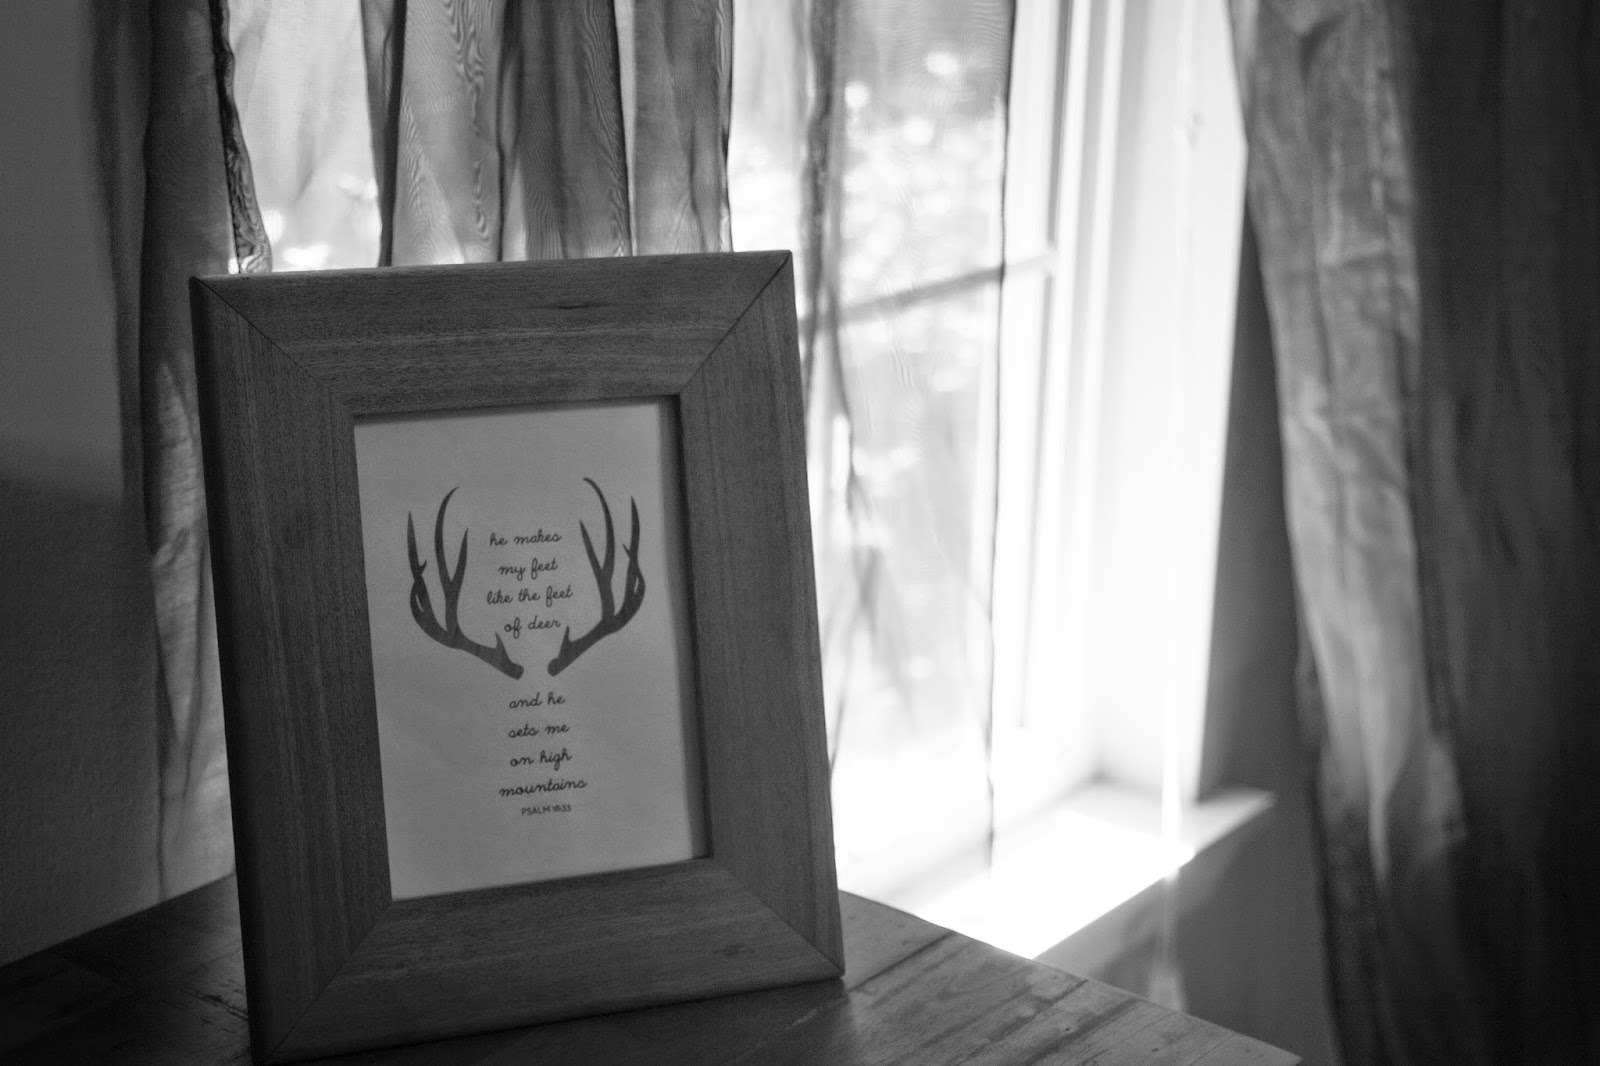 Melinda Wood Designs prints Psalm 42